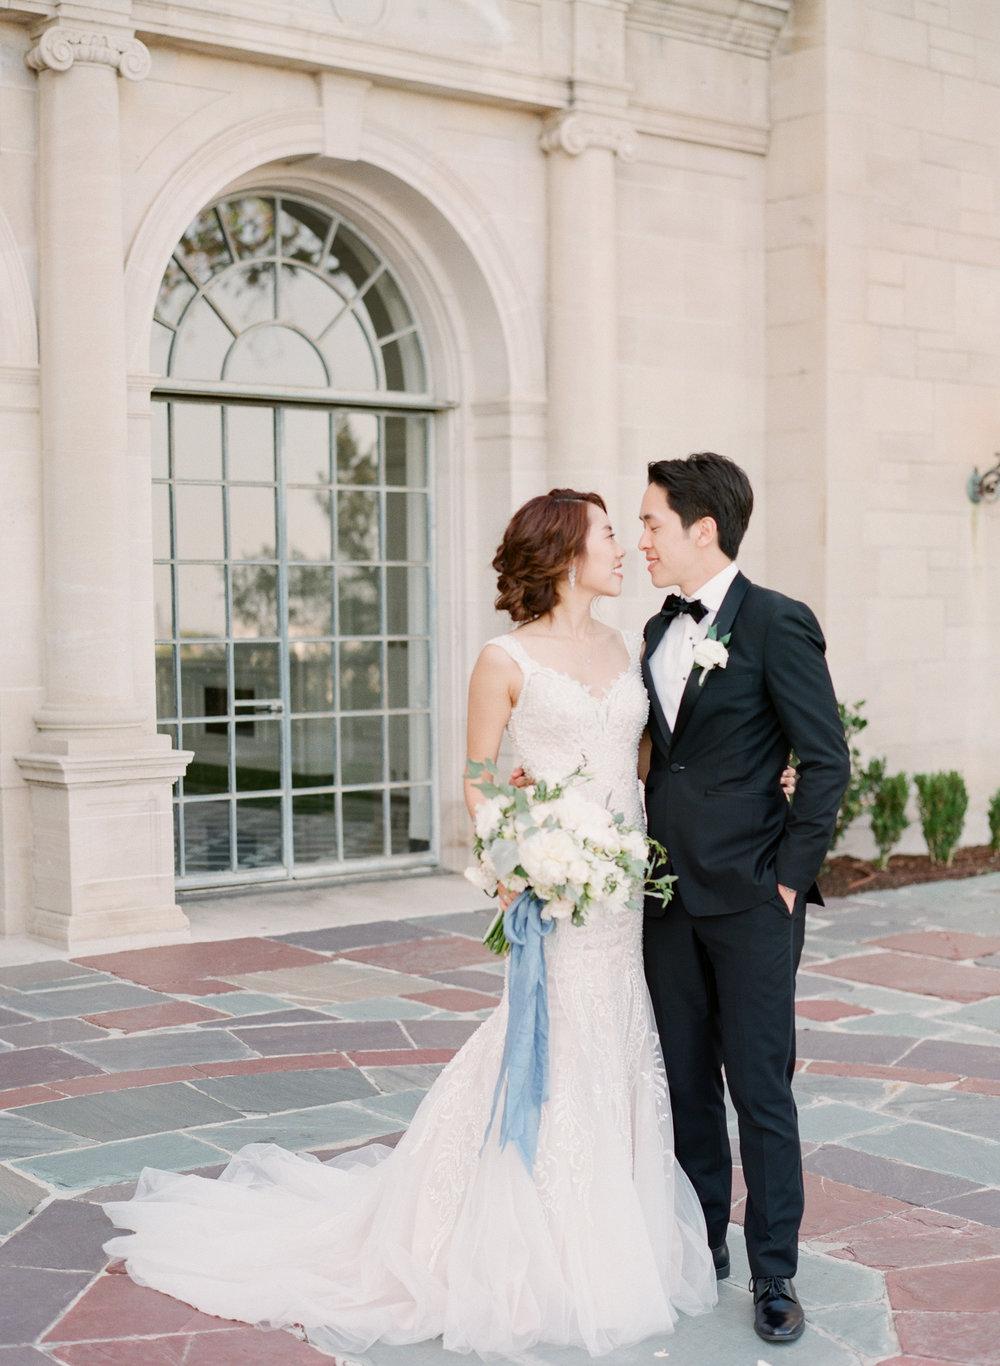 Koman Photography-Greystone Mansion Wedding Wedding-000049270010.jpg